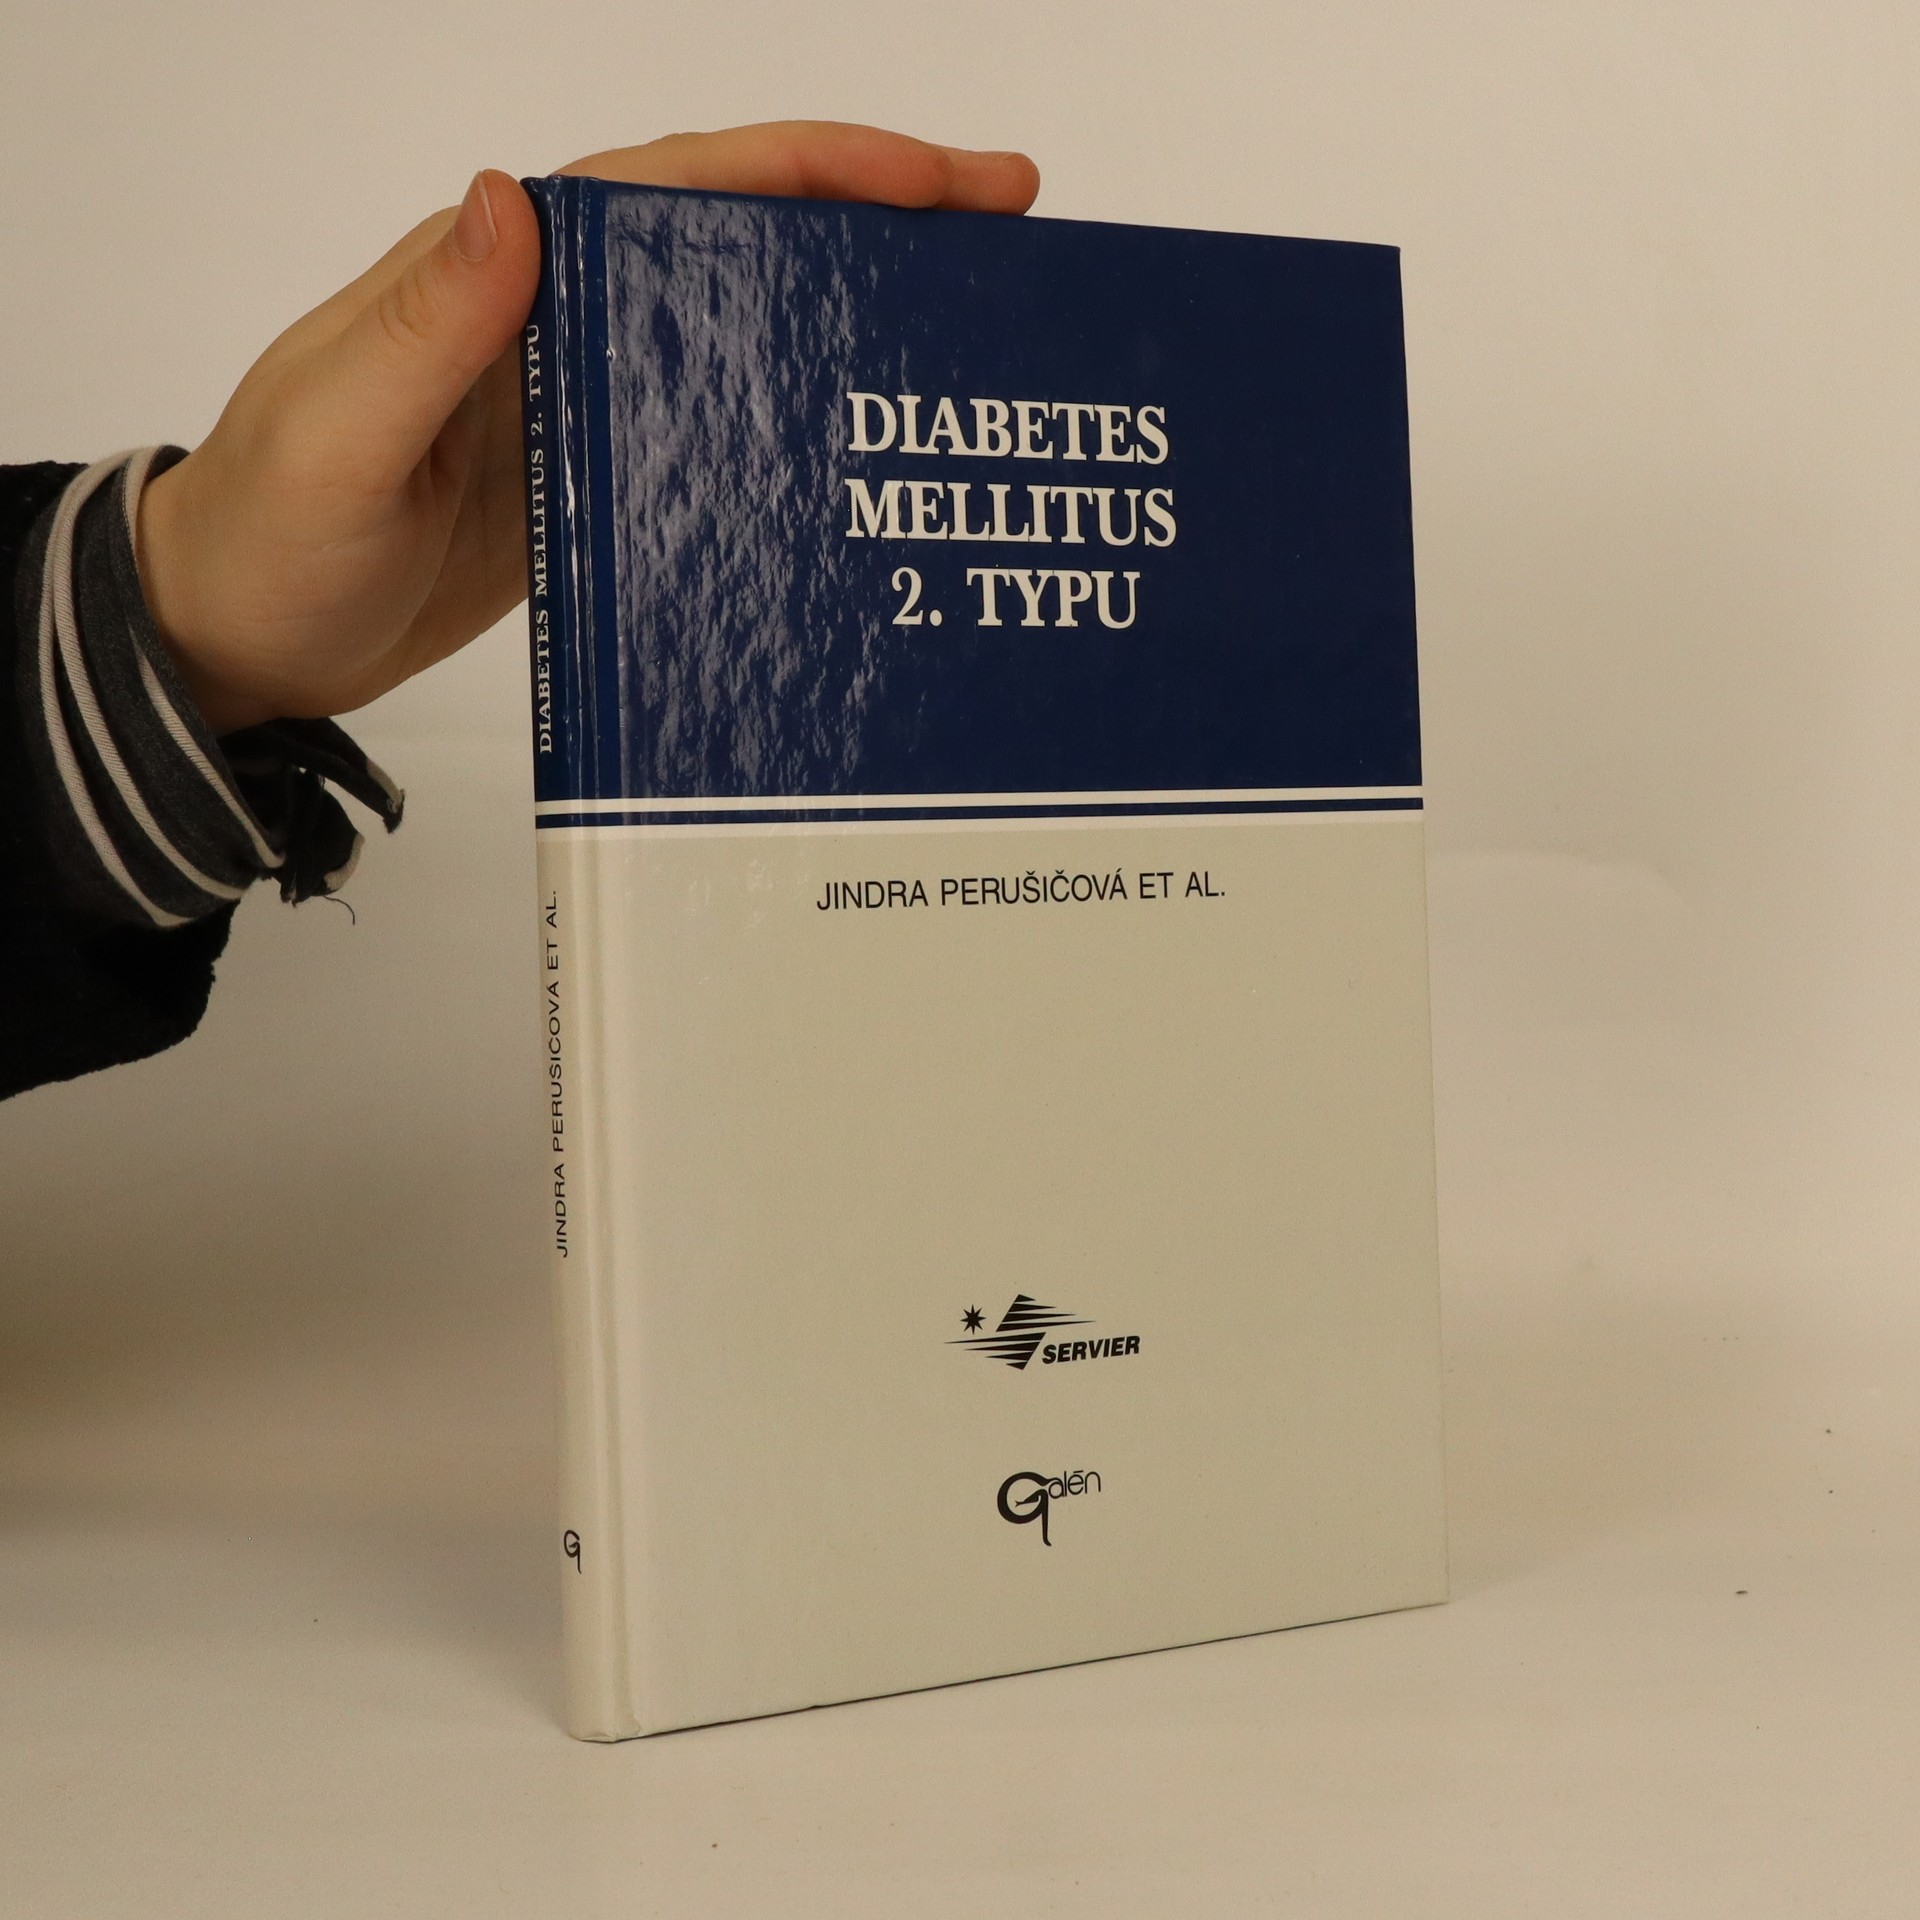 antikvární kniha Diabetes mellitus 2. typu : praktická rukověť, 1996